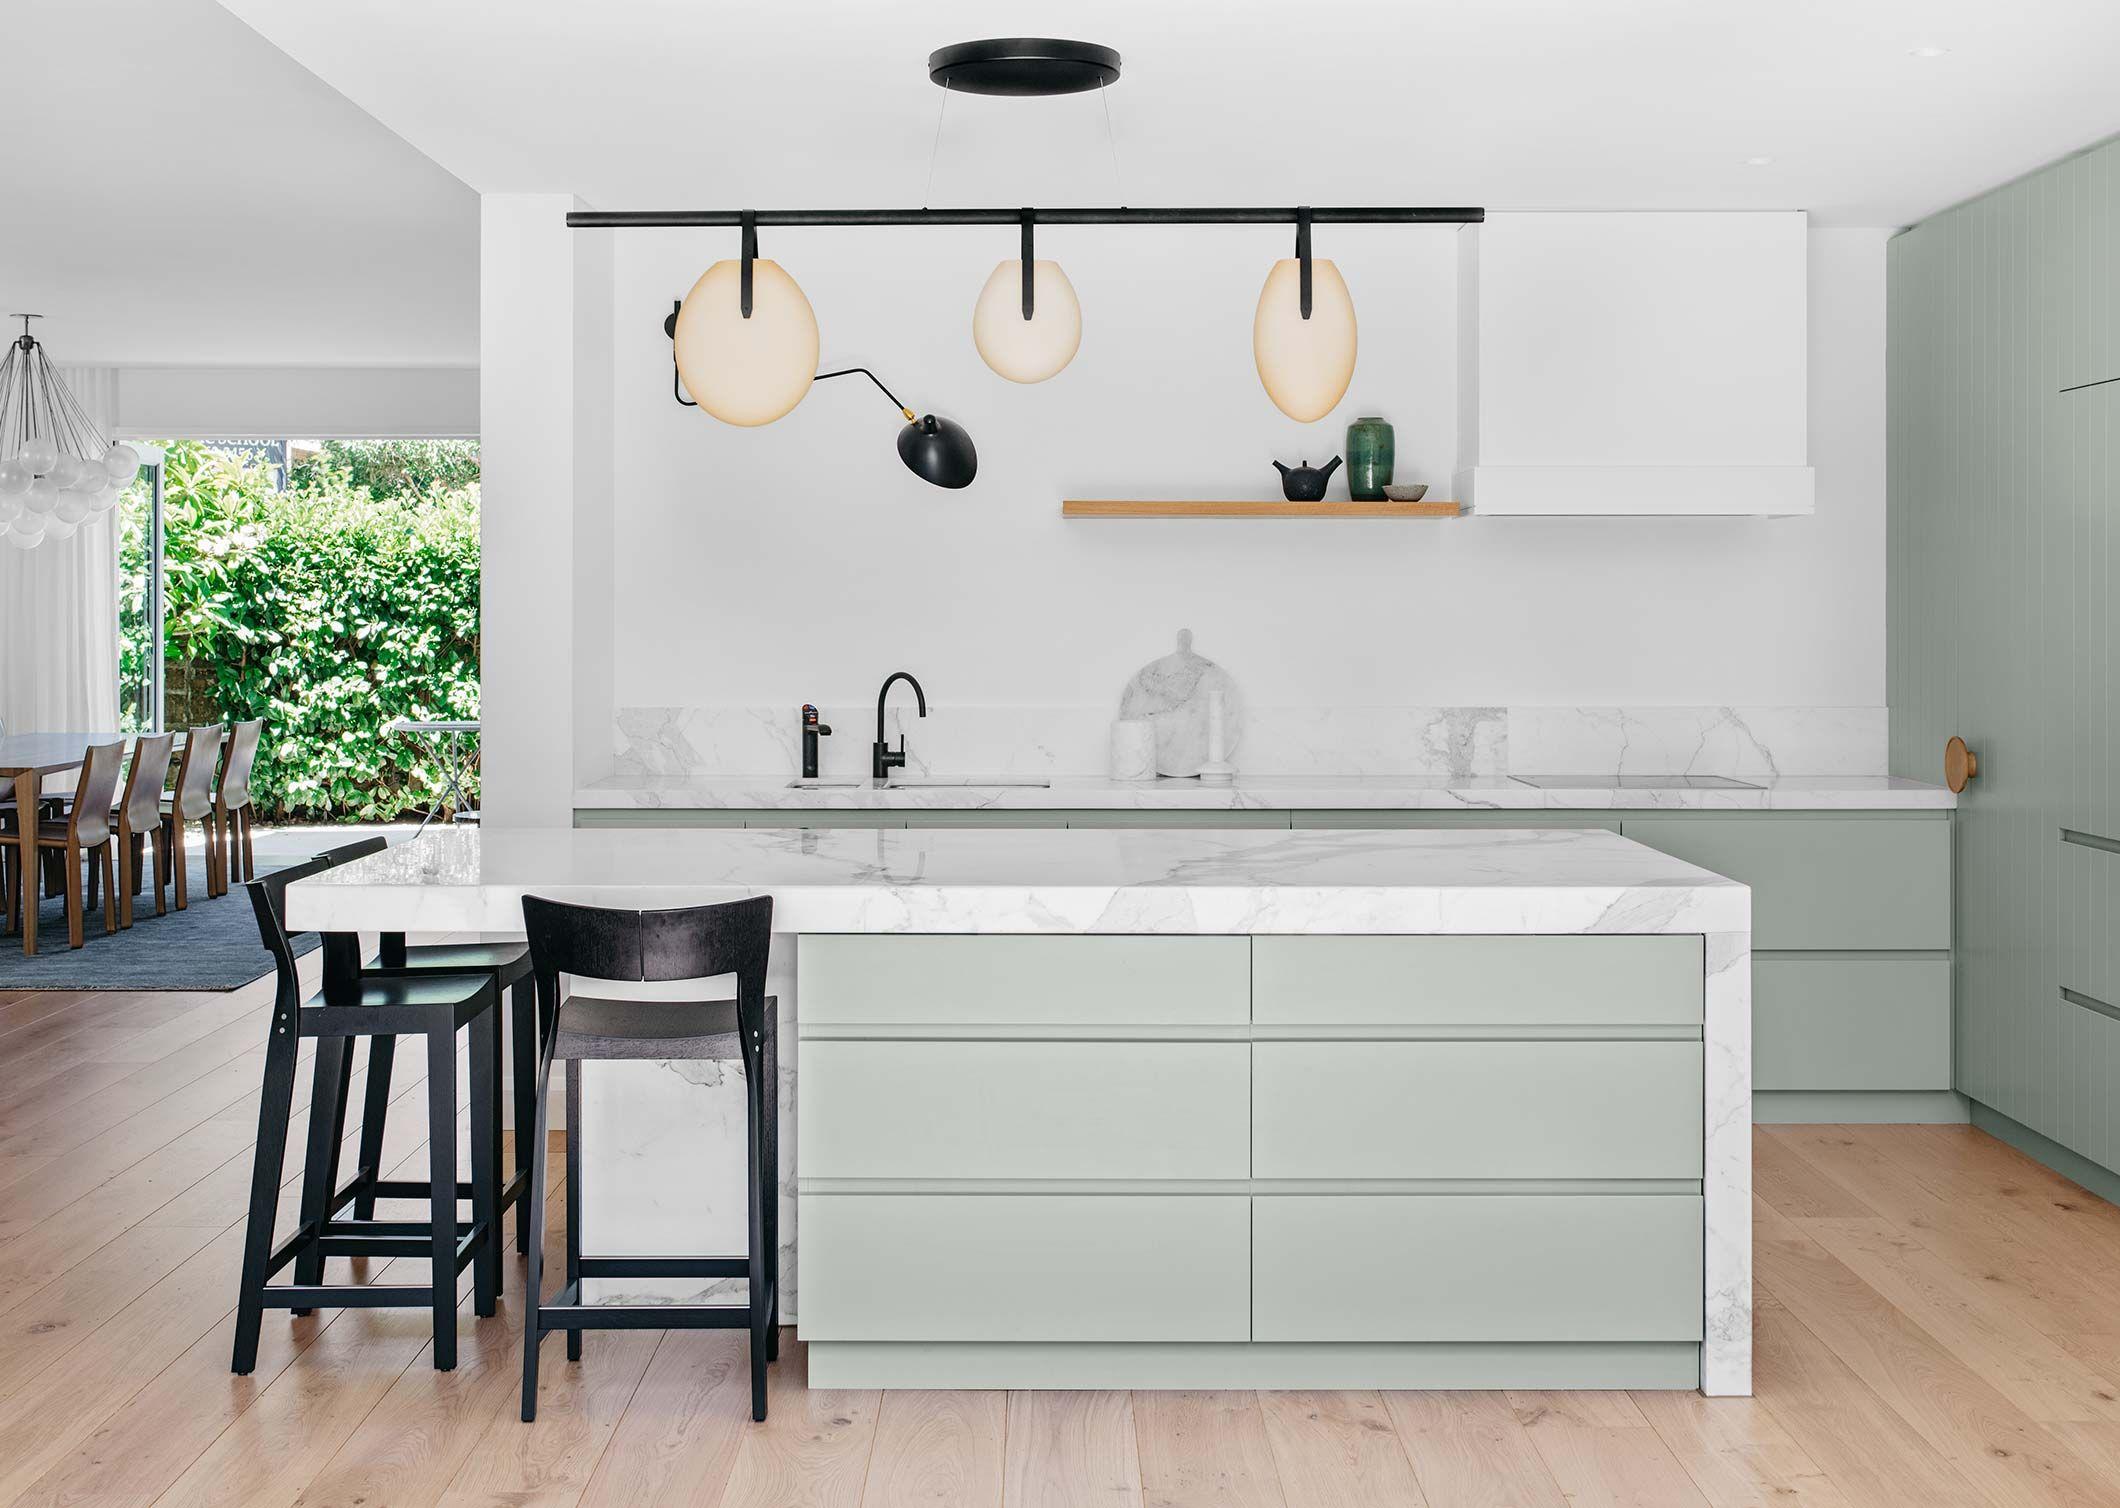 Double Bay House | Arent & Pyke | Kitchen | Pinterest | House ...